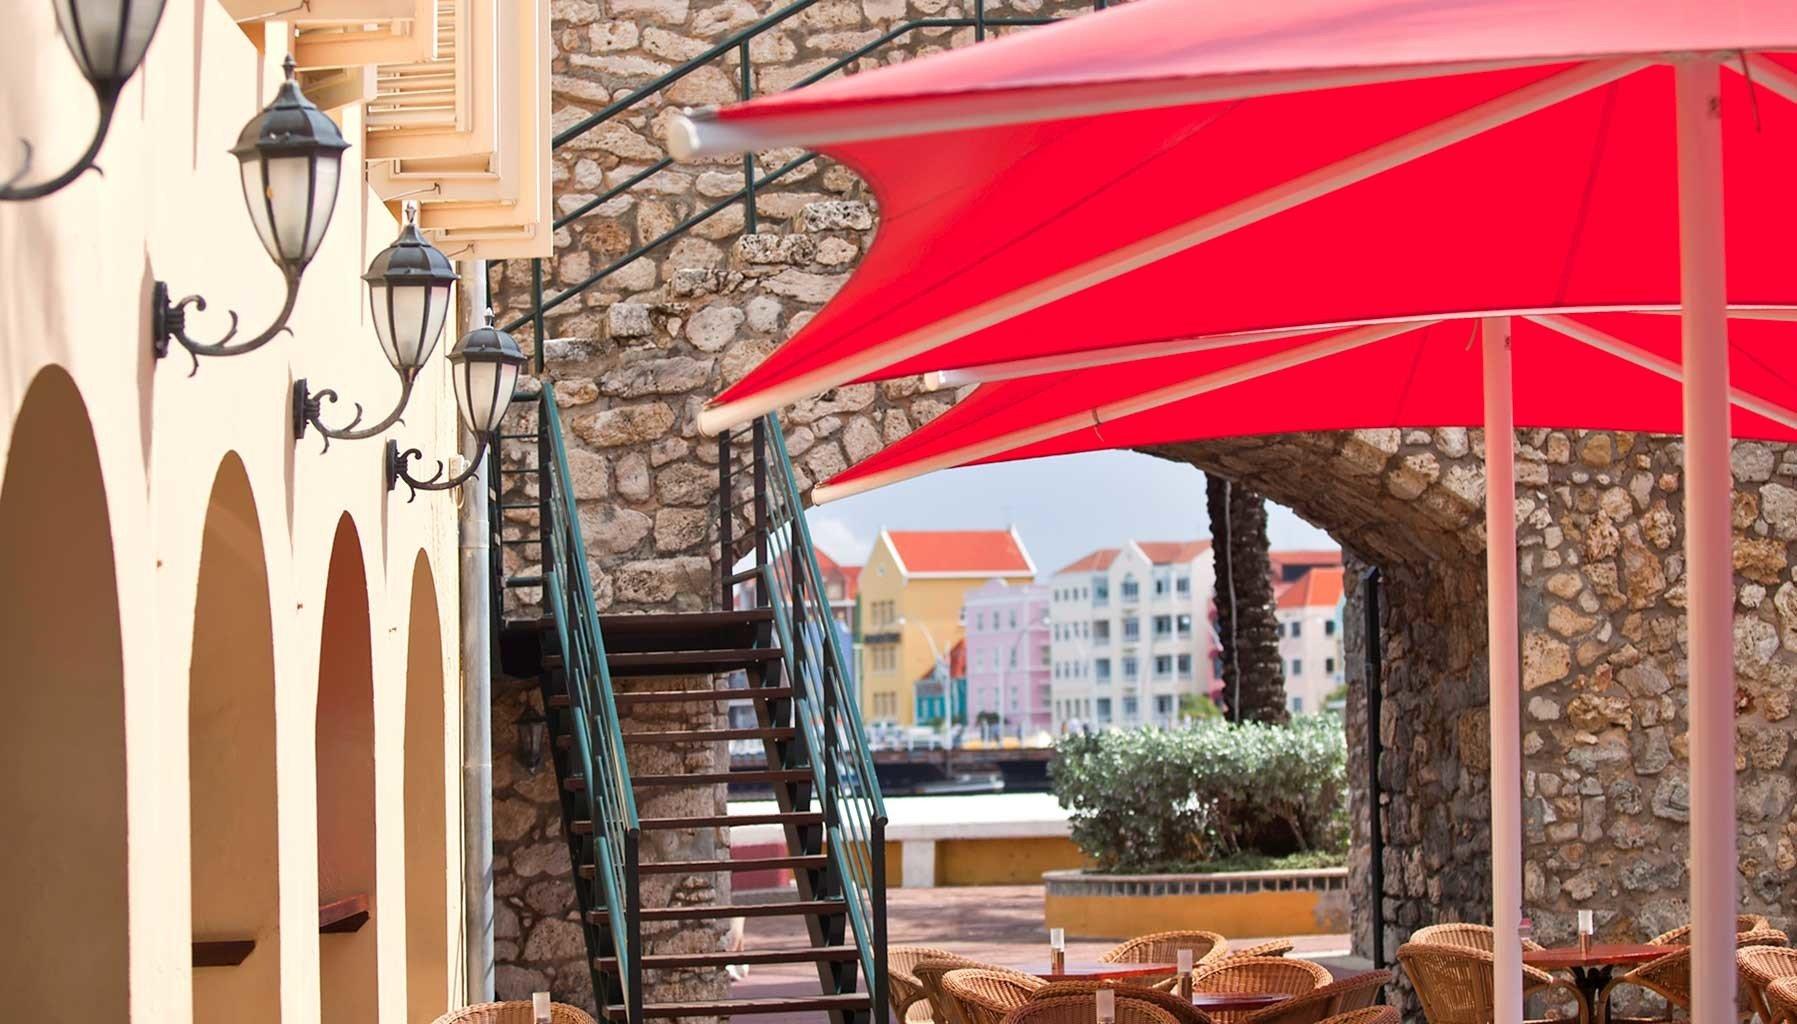 Casino Exterior Grounds Luxury Resort Trip Ideas Waterfront outdoor wooden interior design furniture grill